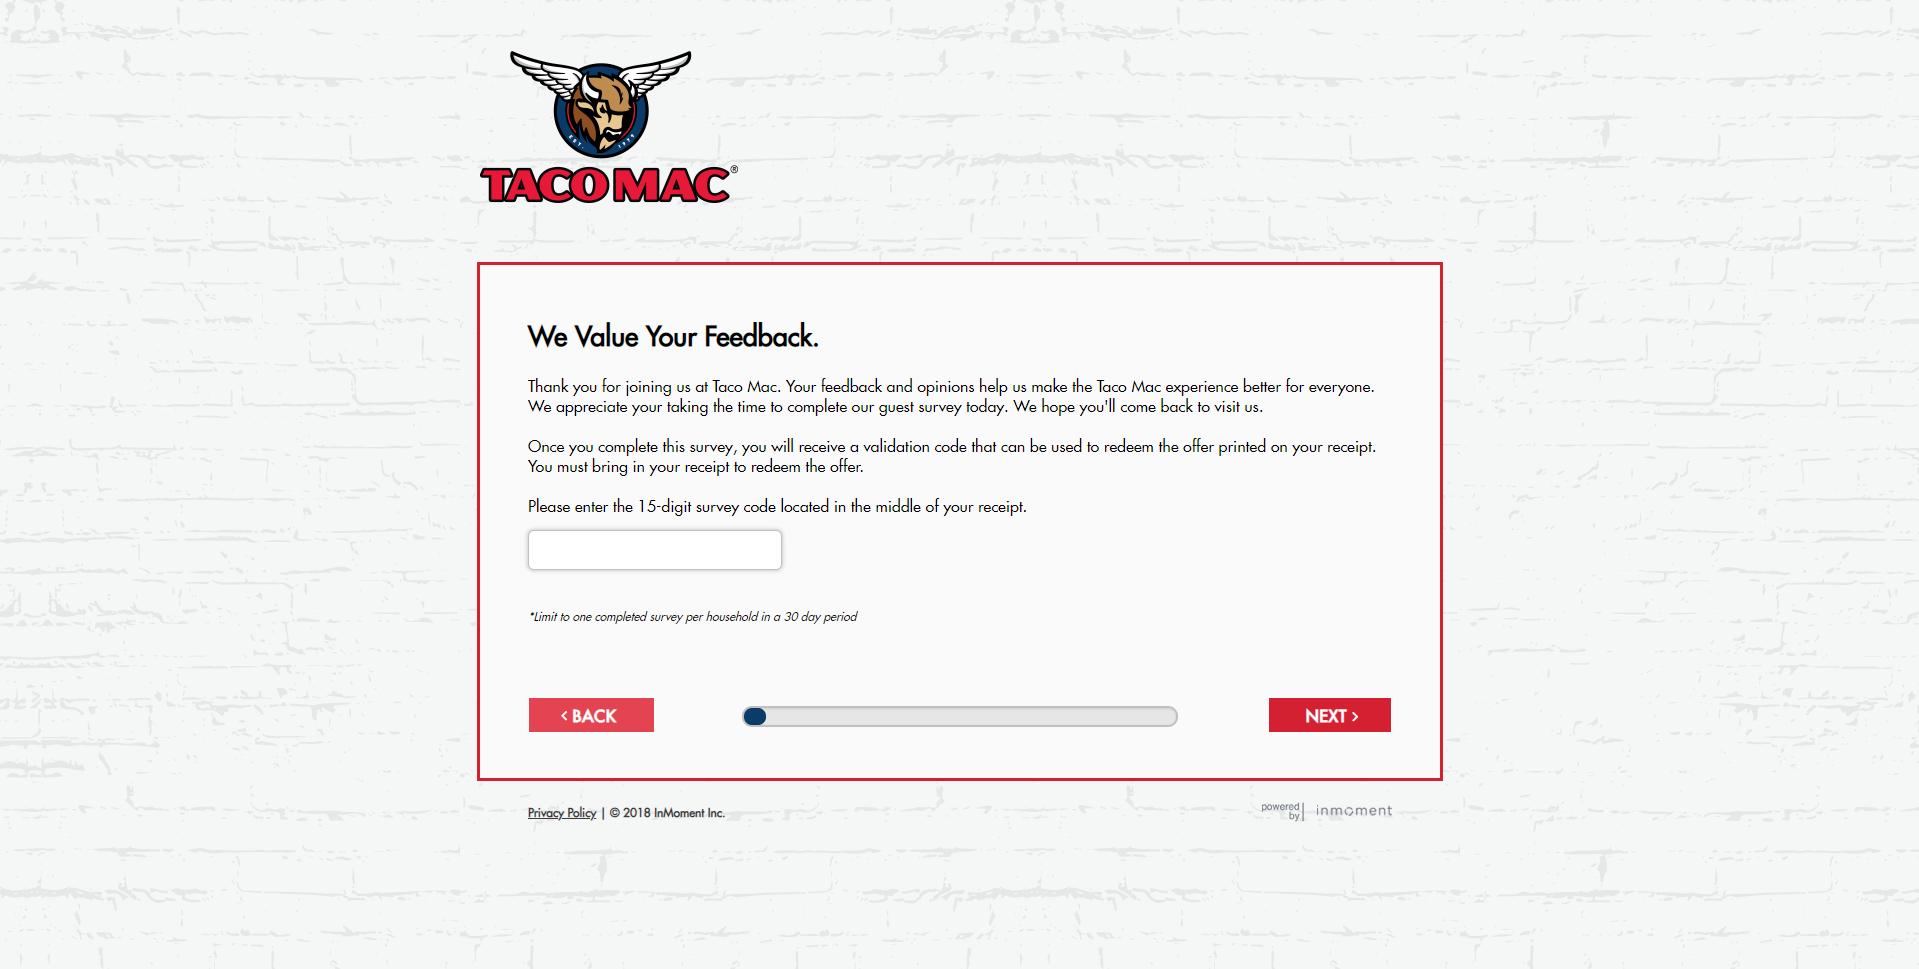 www.tacomaclistens.com